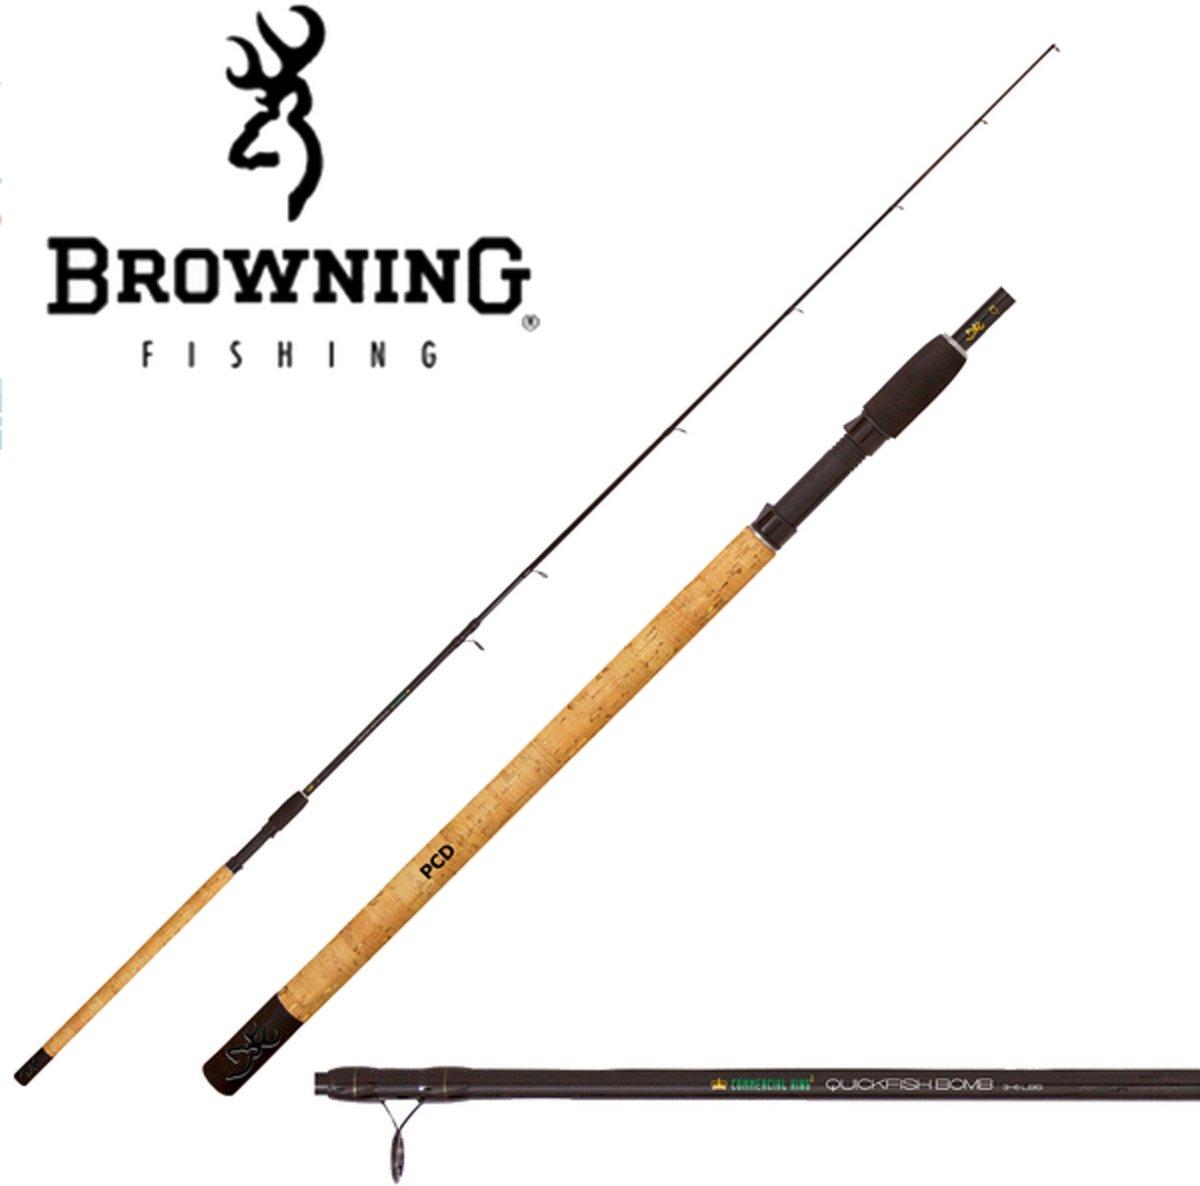 Browning commercial king II quickfish 3.0M 3-6lb   feederhengel